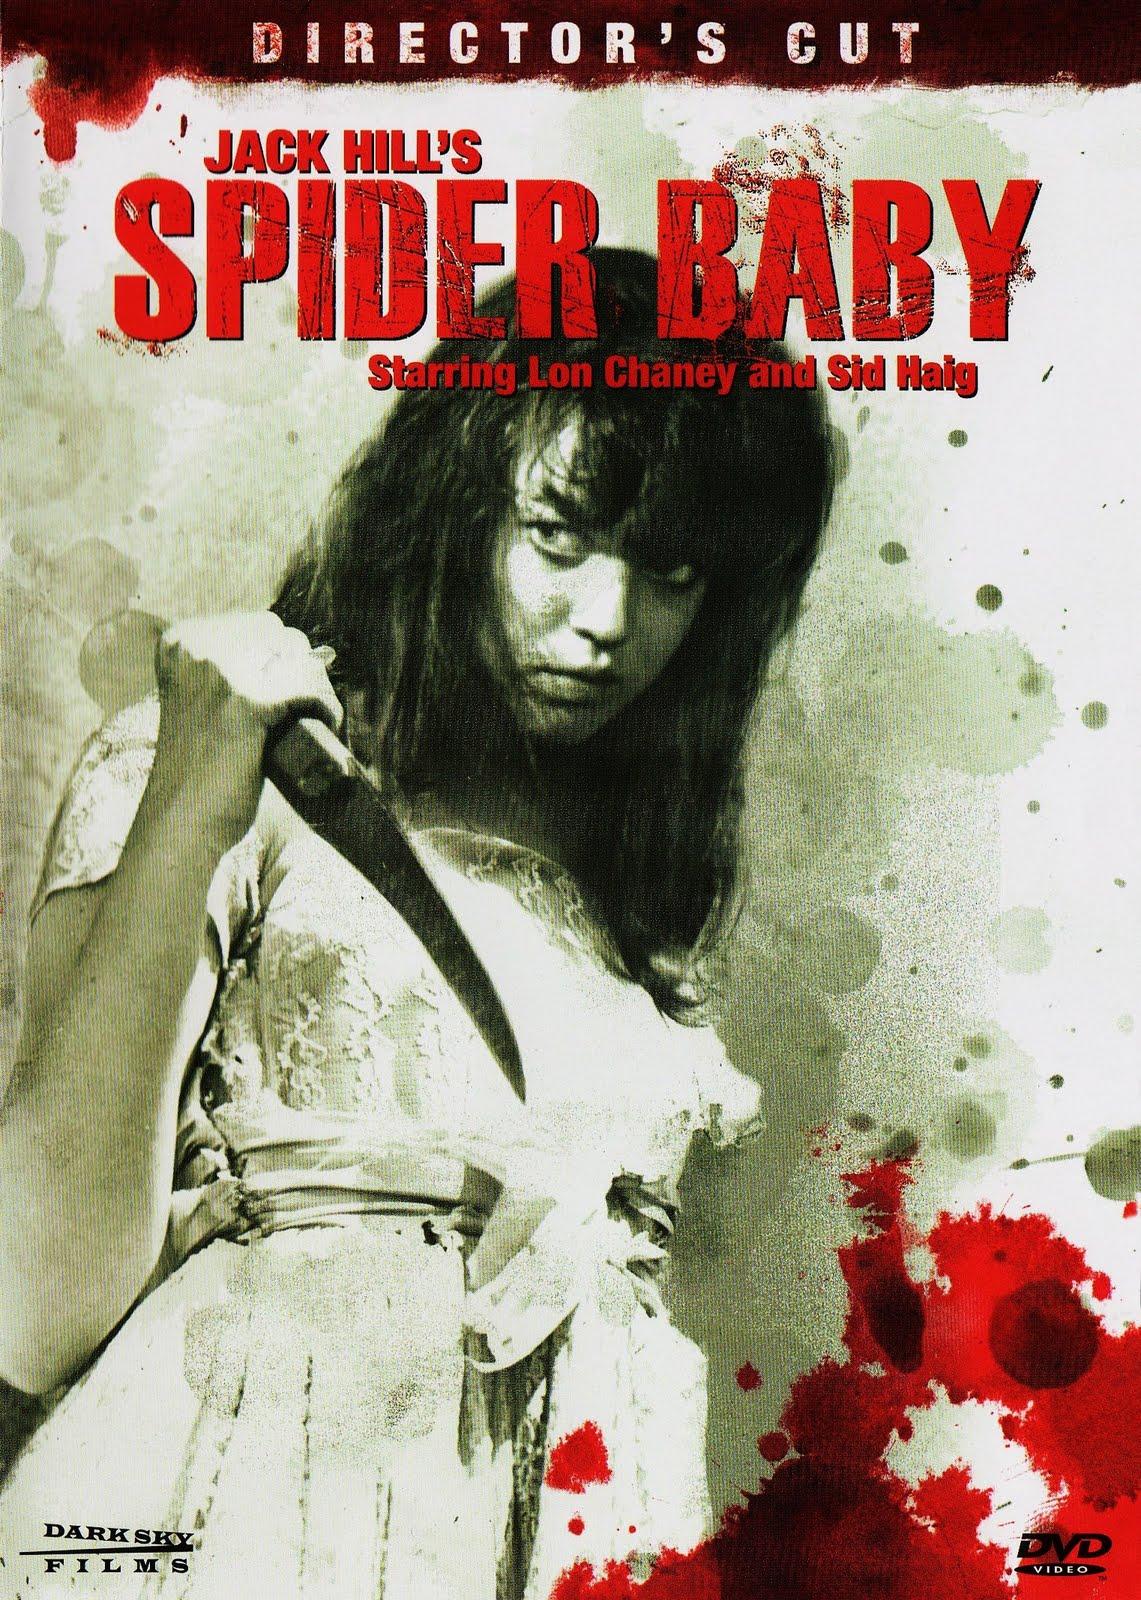 http://2.bp.blogspot.com/_W3bLkLDR-6o/TRuccjDqanI/AAAAAAAAJ5M/oxTW9ITnE-c/s1600/Copia+de+Spider_Baby.jpg